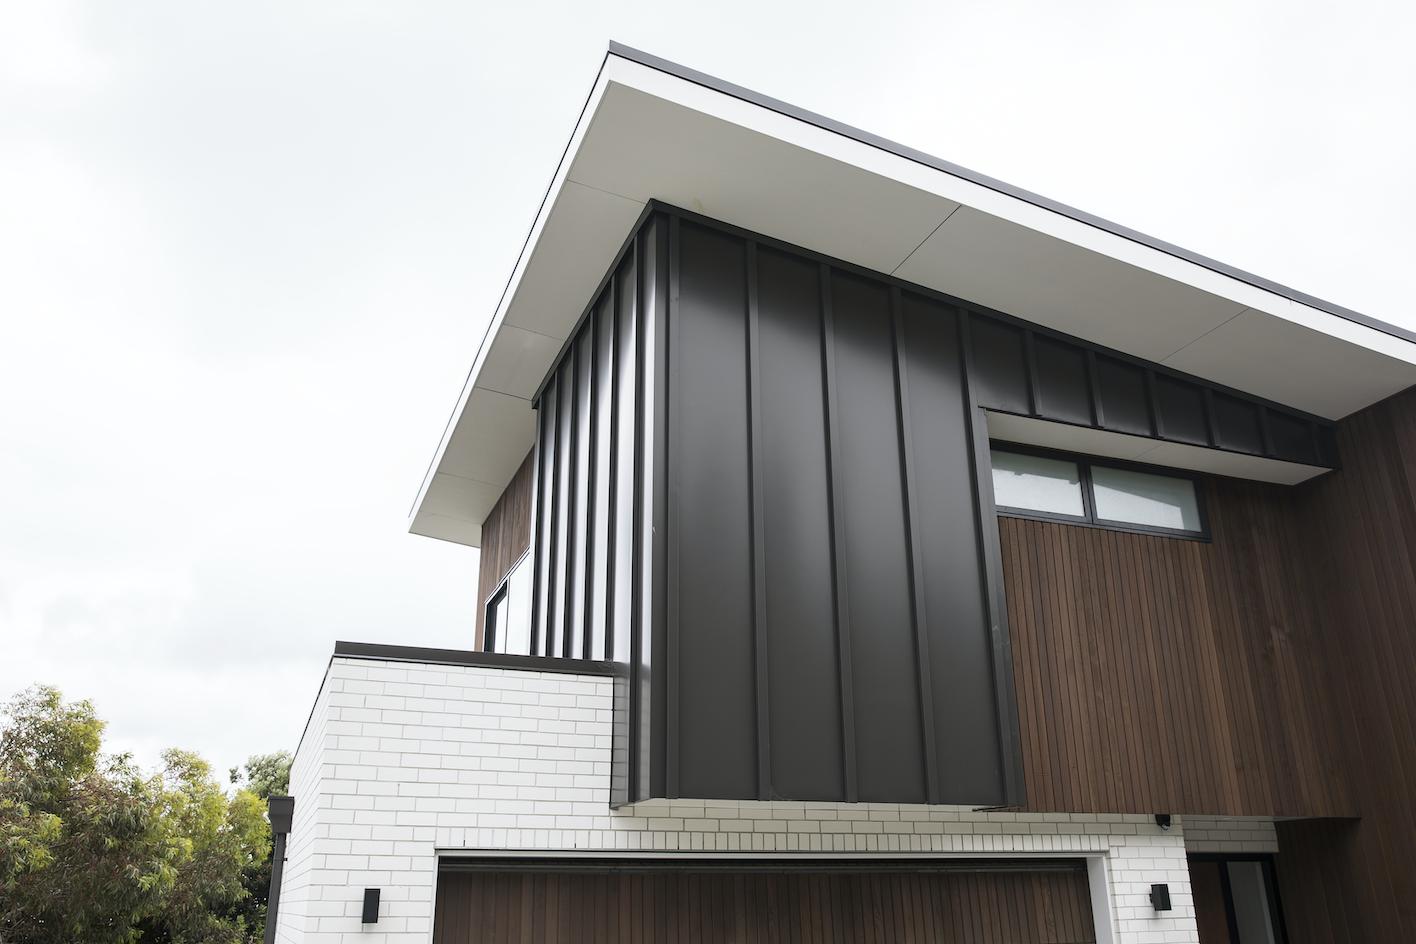 The-Roofing-Store-Steel-Metal-Standing-Seam-Batten-Cap-Virtor+-ZX-Ironsand-6-LR.png